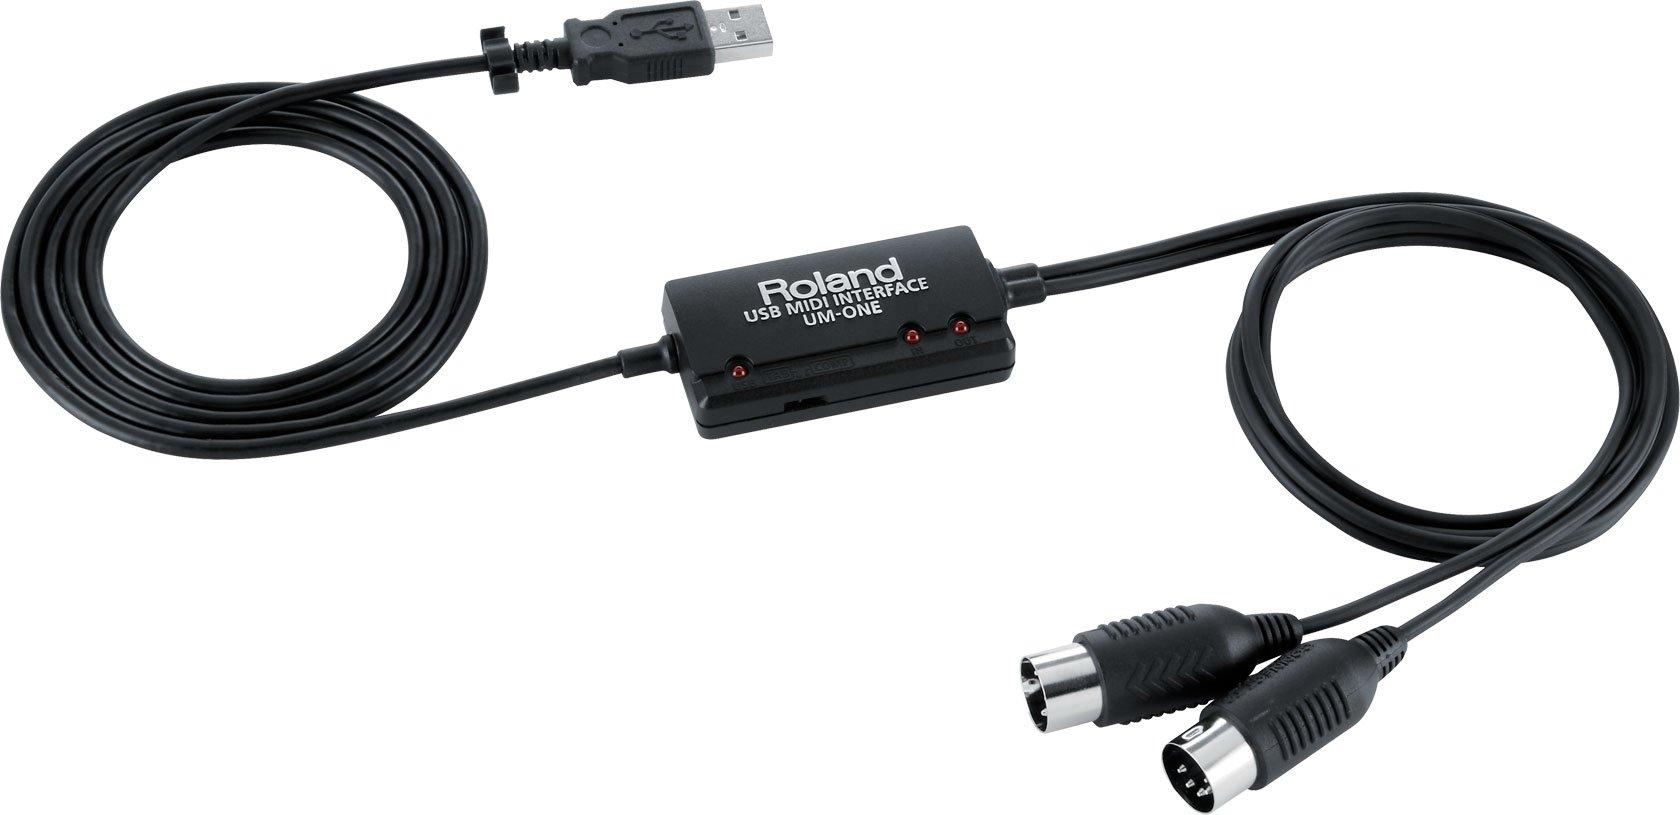 Roland UM-ONE MK2 USB MIDI Interface - OPEN BOX